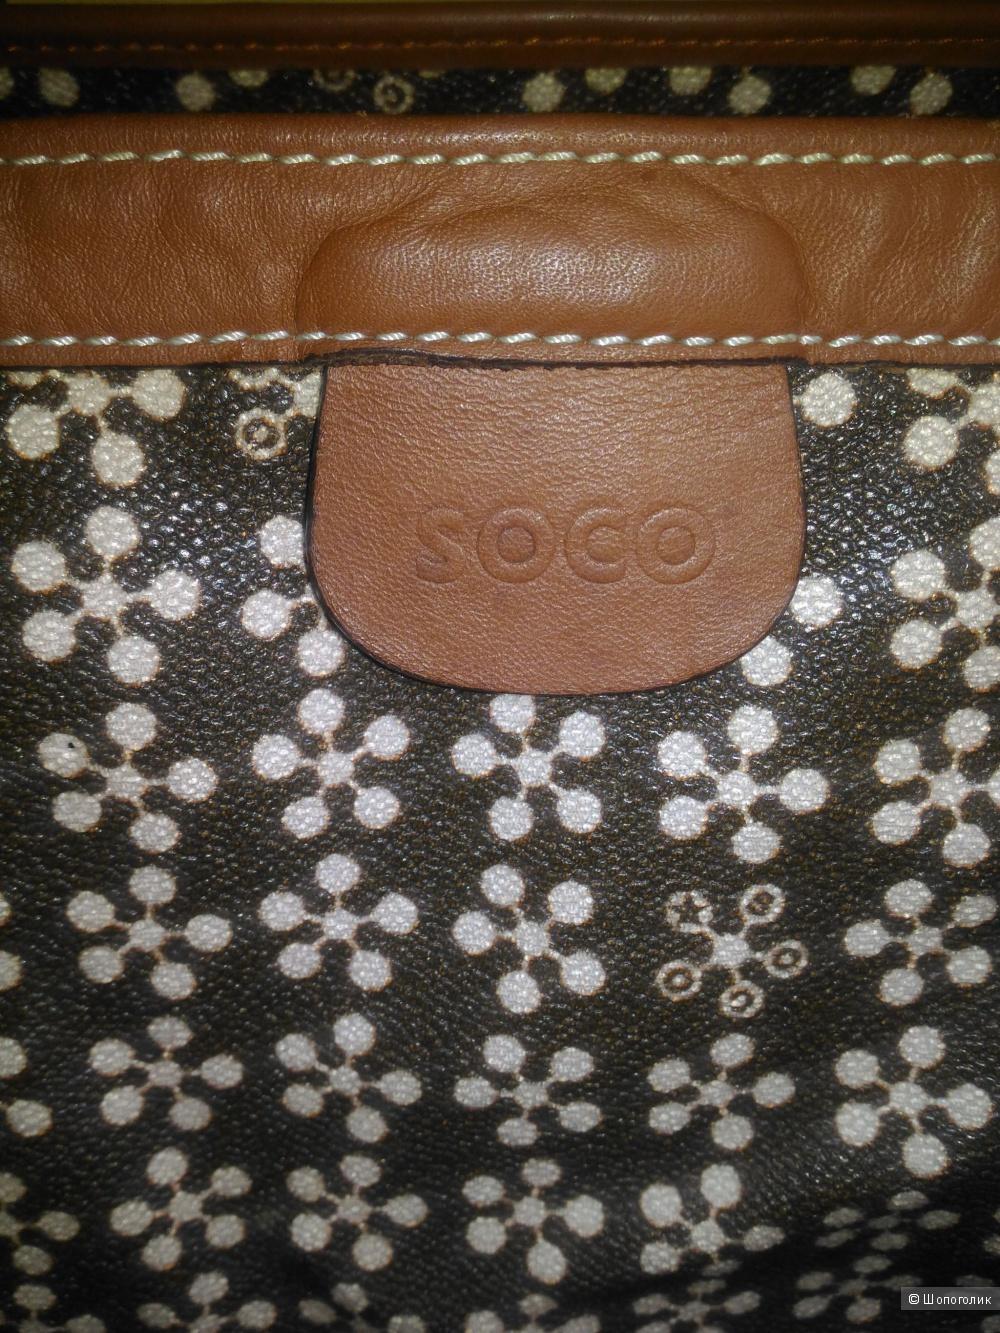 Сумка SOCO